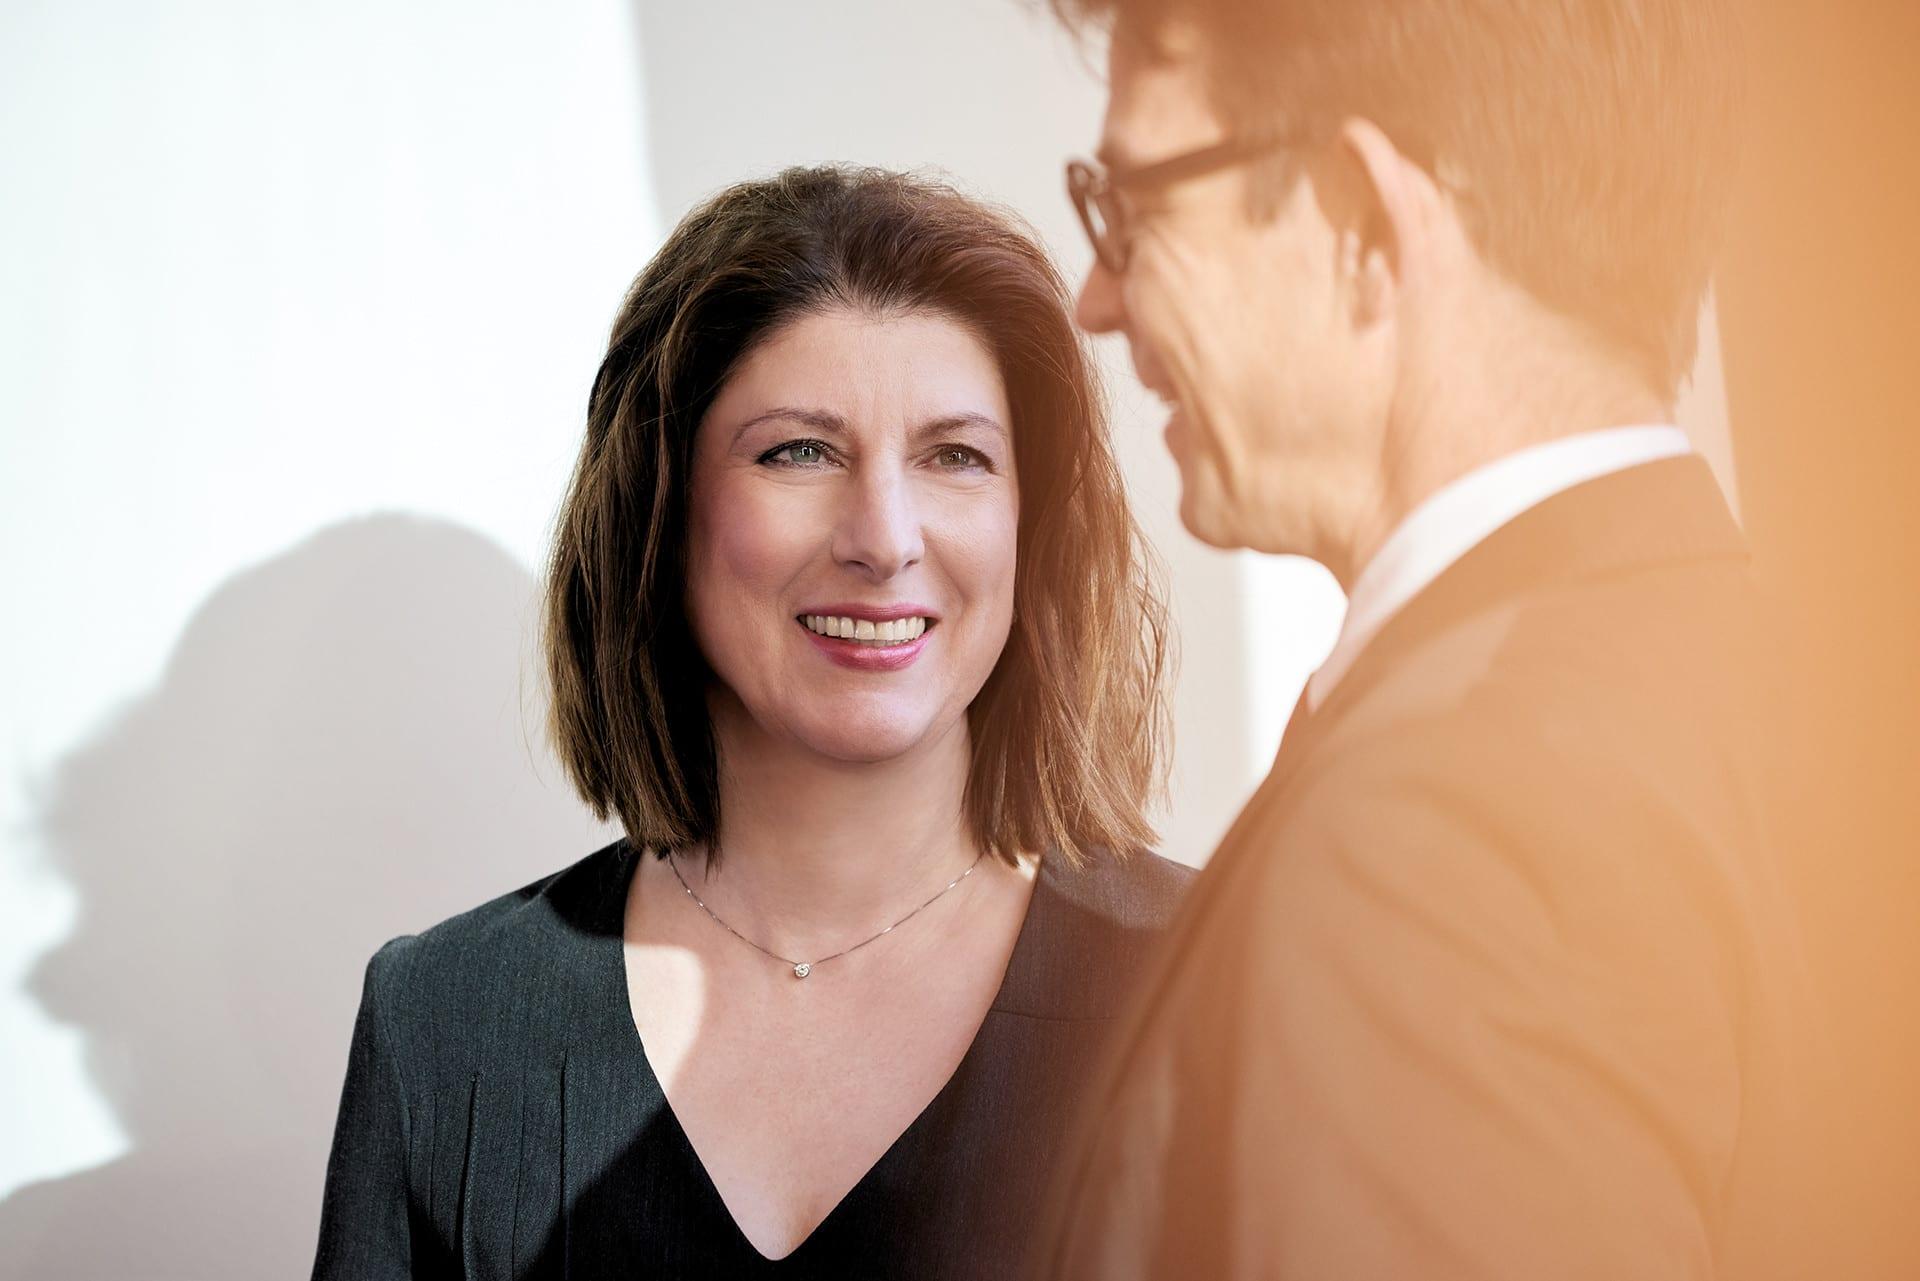 Beate Fiedler - Rechtsanwältin in Berlin bei Schwenke Schütz